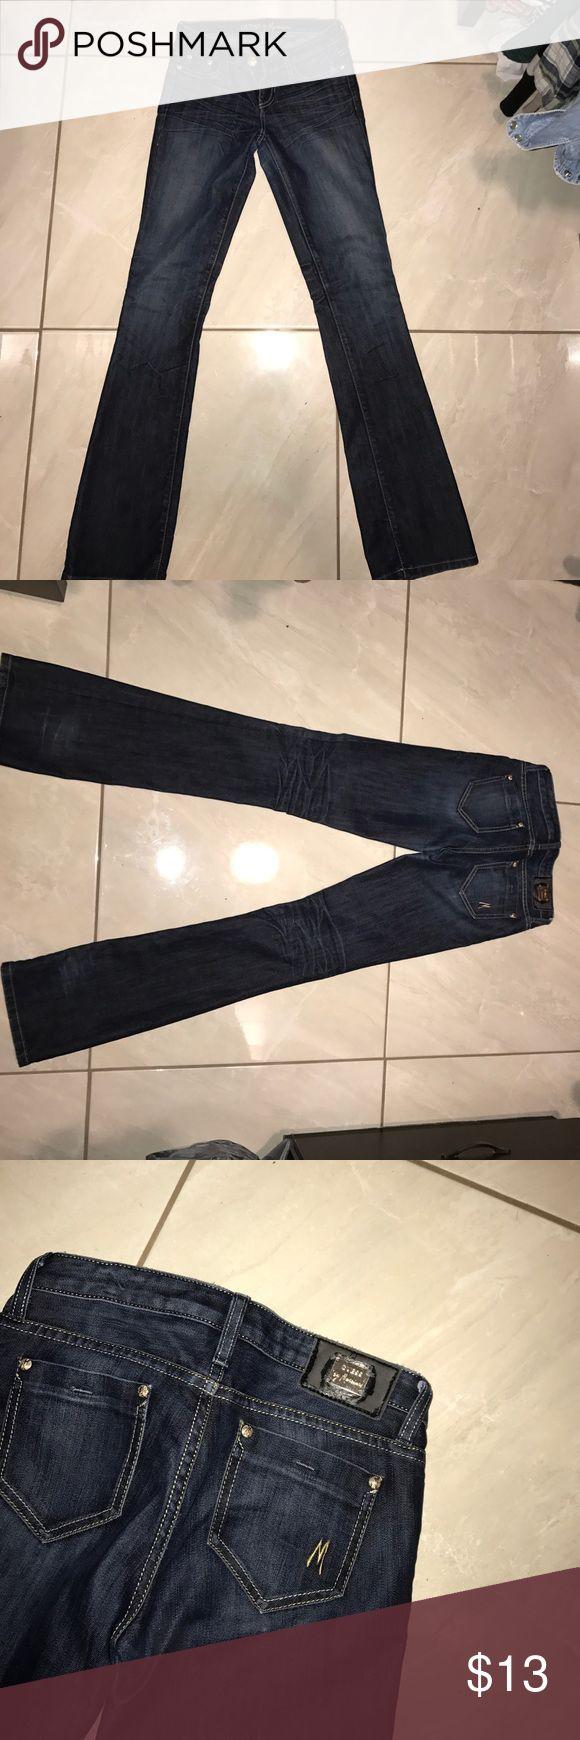 Guess by Marciano jeanas Guess by Marciano jeans Guess by Marciano Jeans Boot Cut